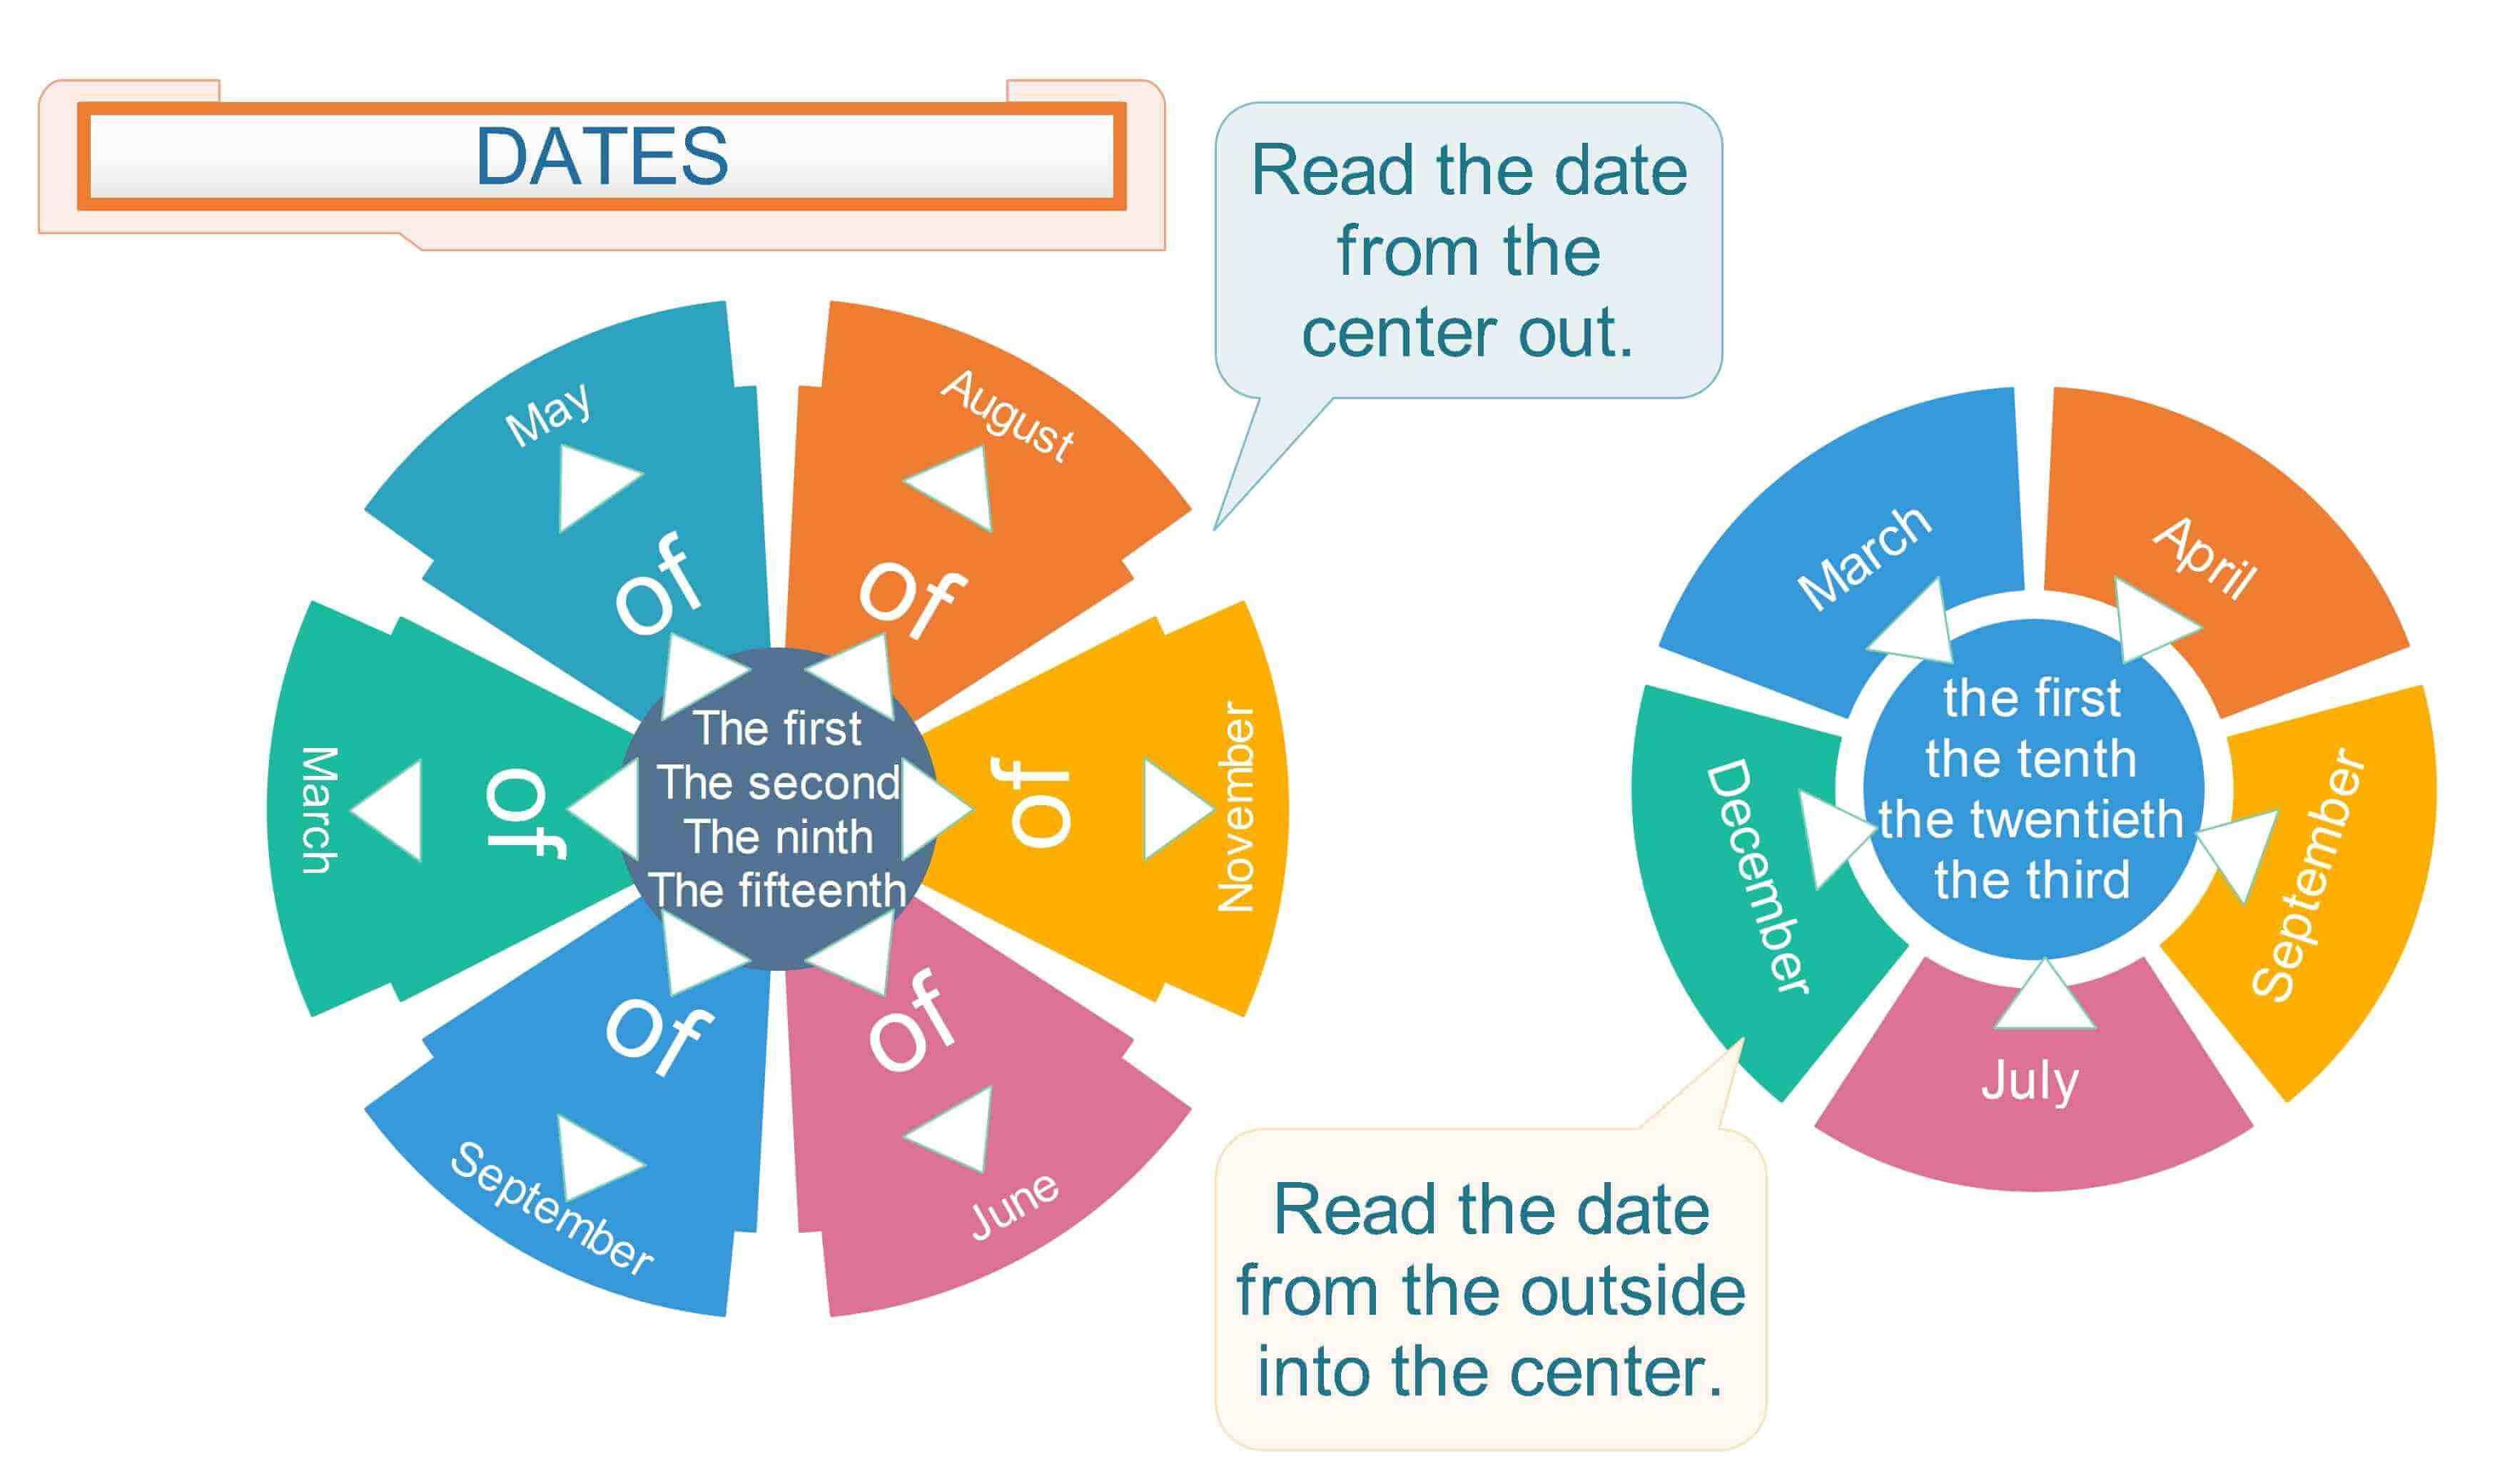 Dates infographic engames.eu